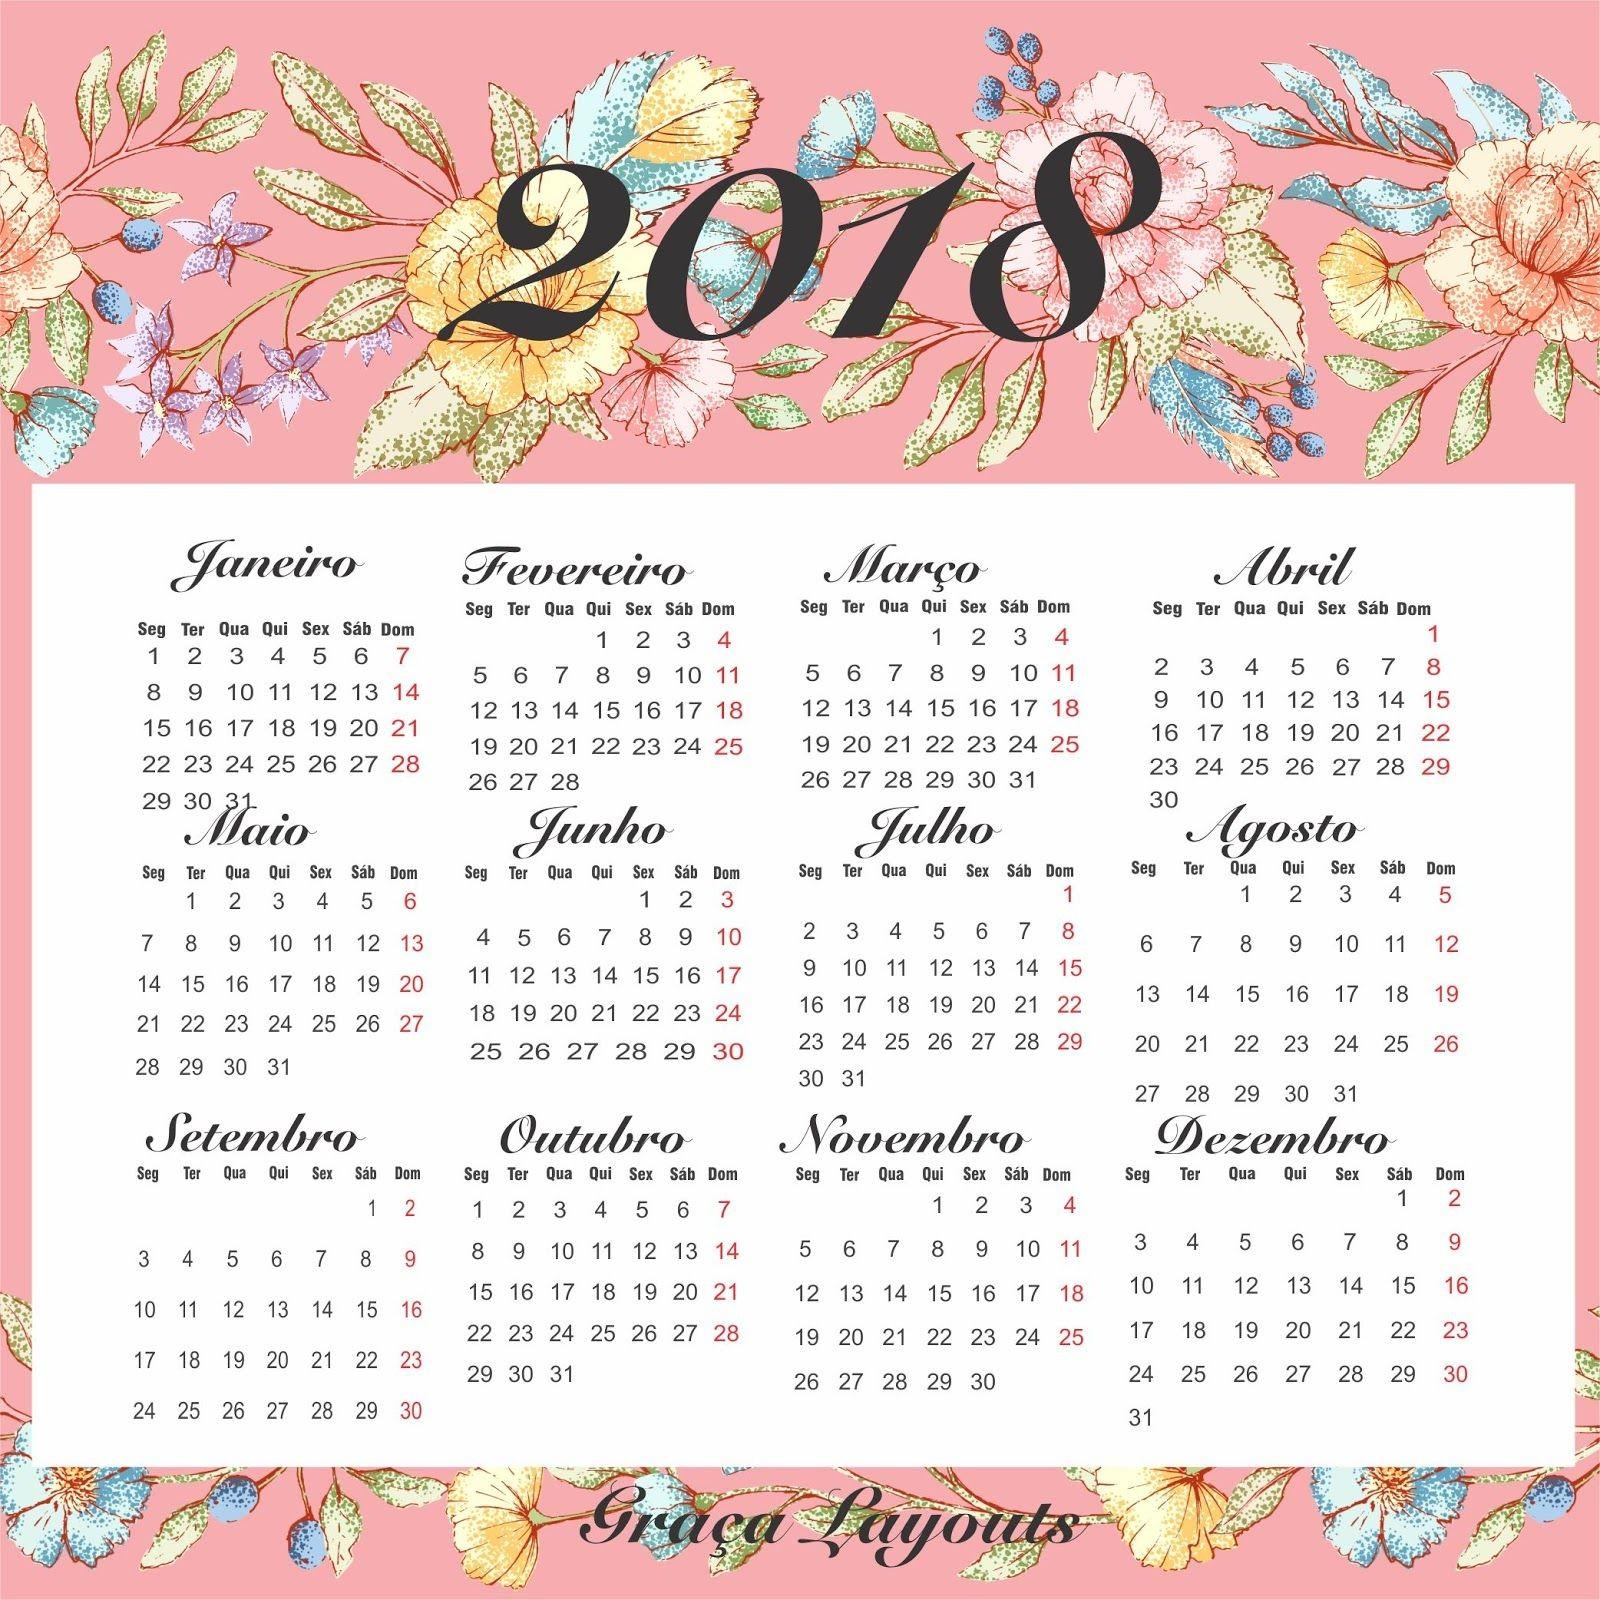 Calendario De Google Para Imprimir Más Caliente Calendários 2018 Para Baixar E Imprimir Invitaciones Of Calendario De Google Para Imprimir Recientes 165 Best Ideas Para Planificador Images On Pinterest